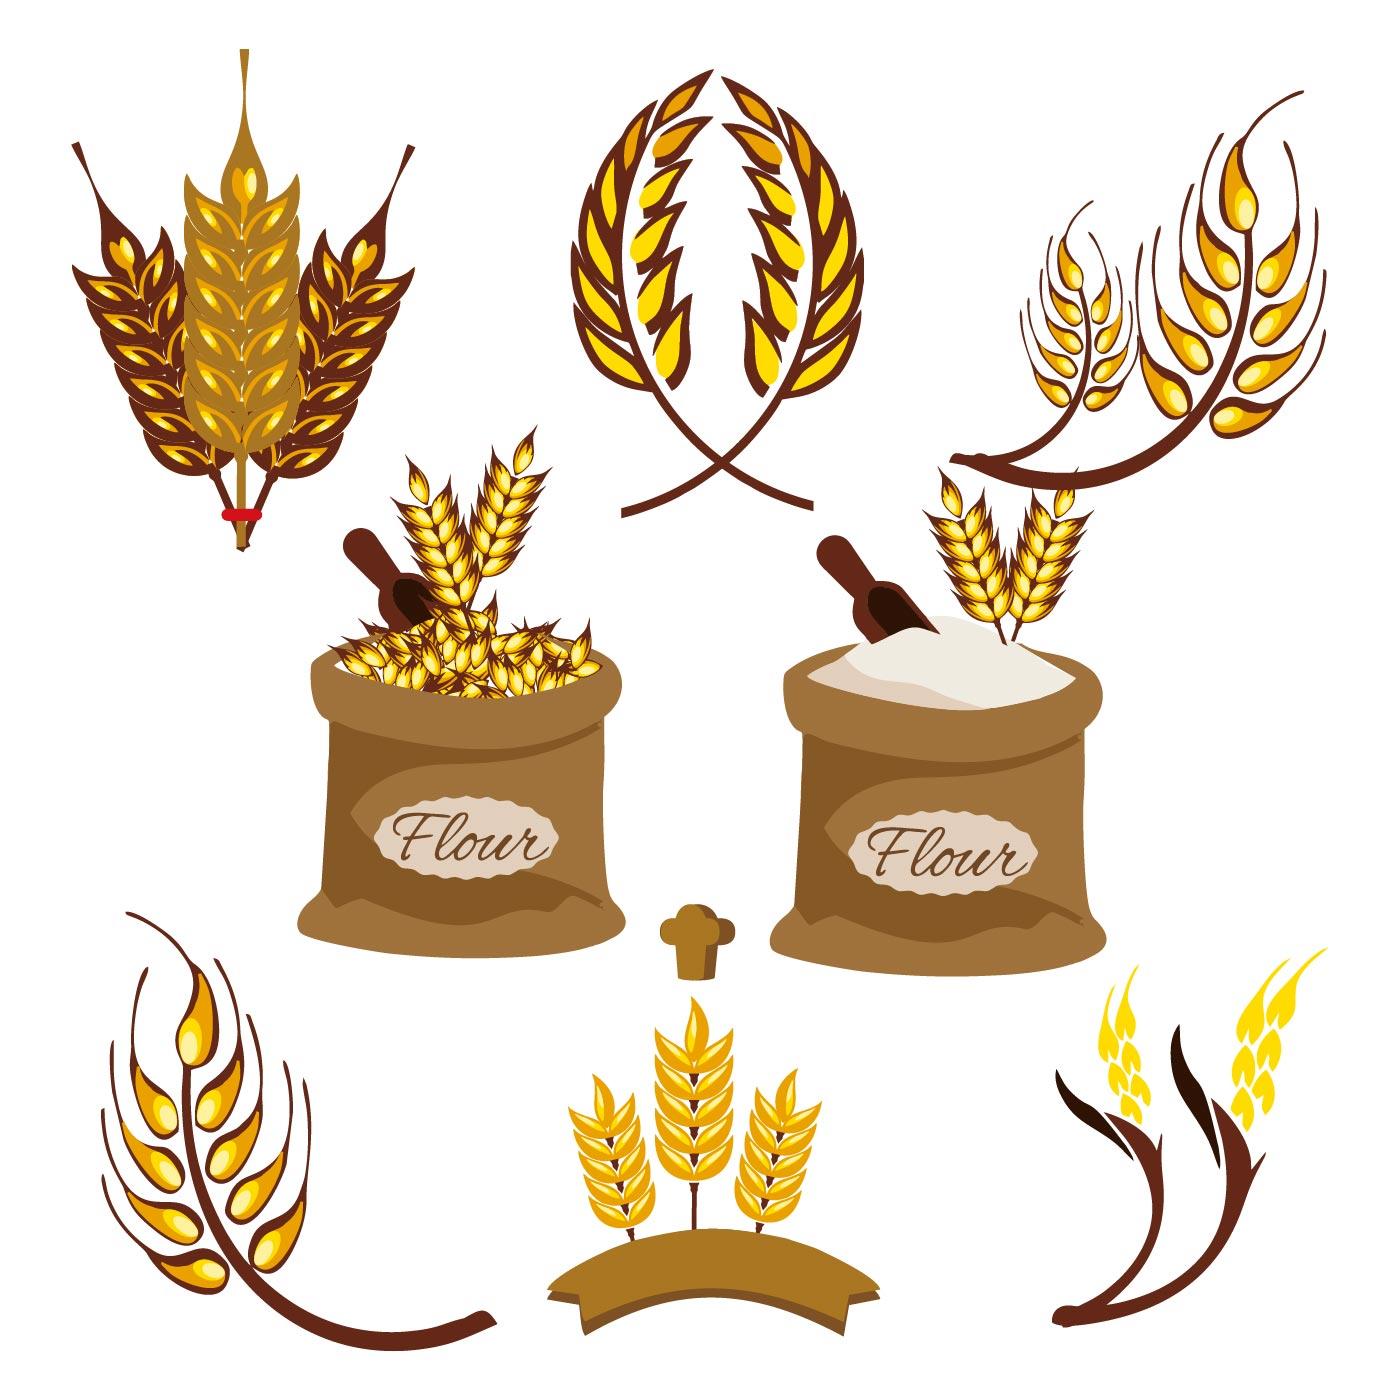 Wheat Ears Vector - Download Free Vector Art, Stock ...